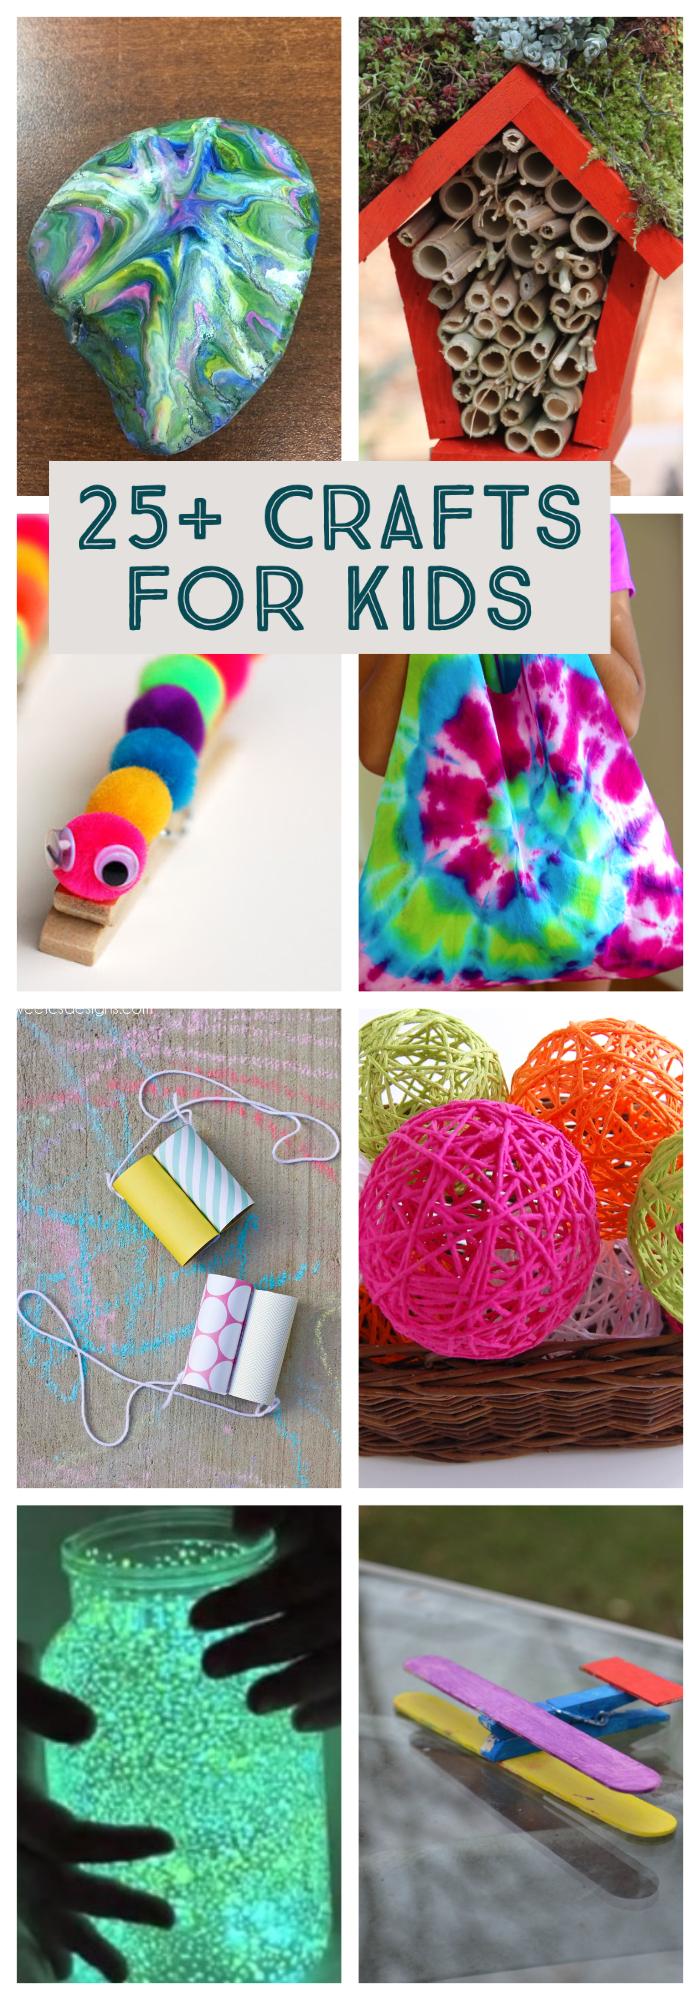 25+ Crafts for Kids   NoBiggie.net